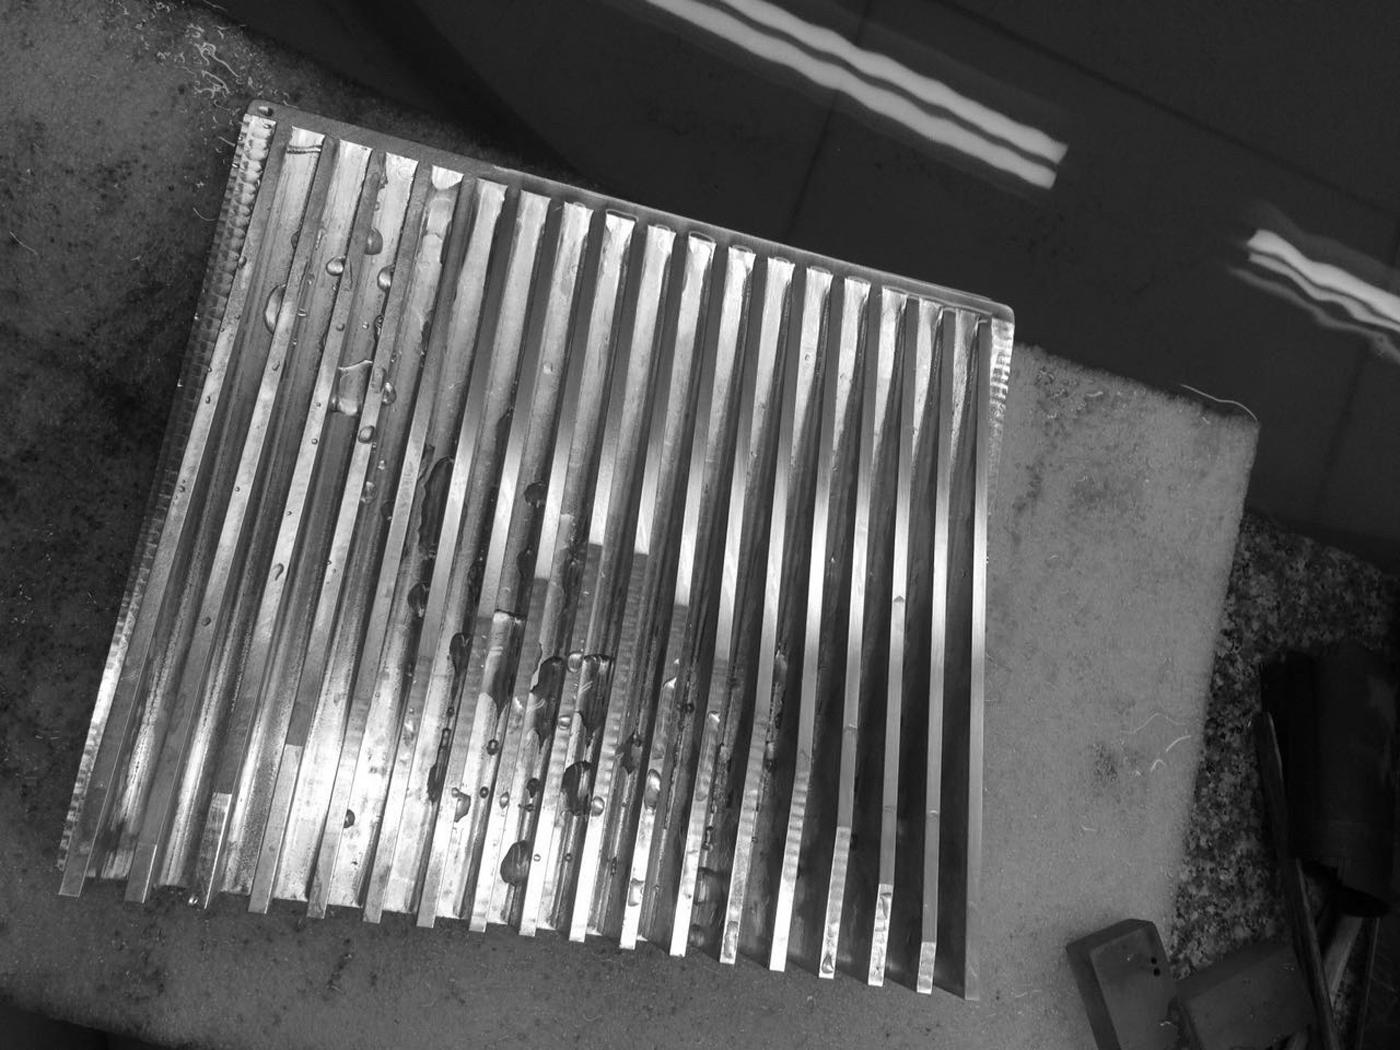 heatsink Heat Sink aluminum Laptop laptop stand material manufacturing metal aluminium anodized cnc minimal modern